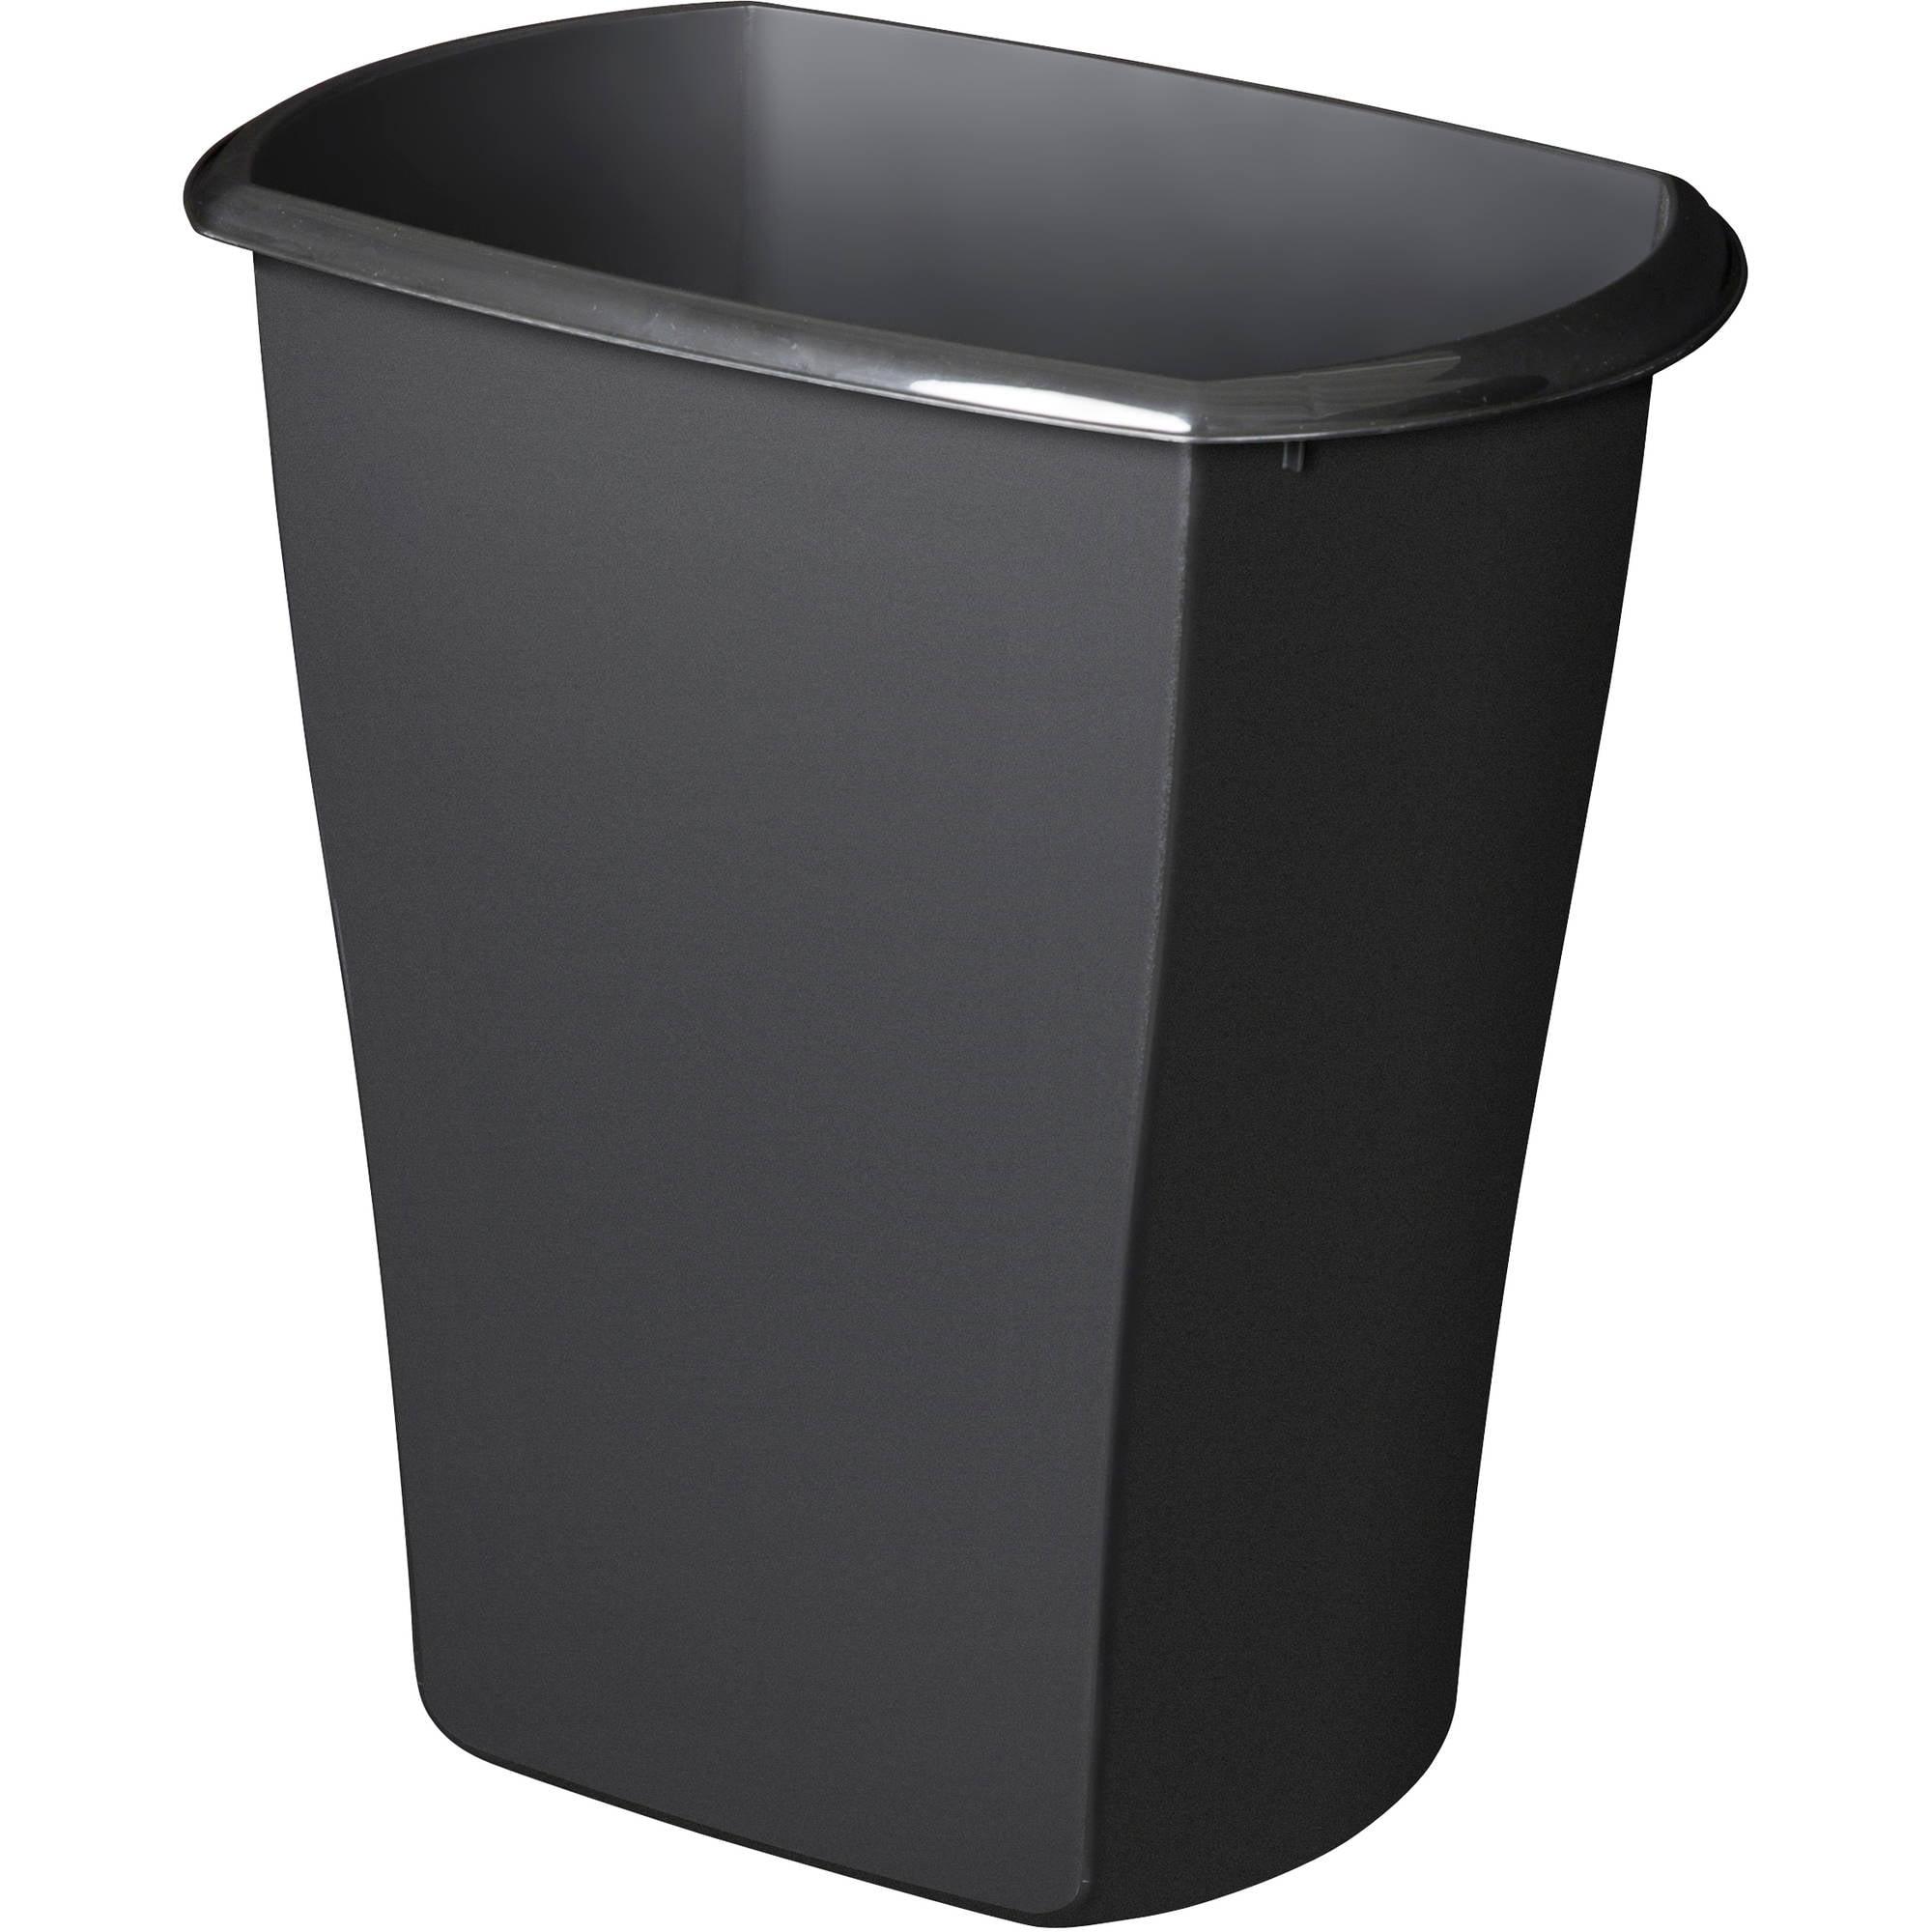 Mainstays 3-Gallon Wastebasket